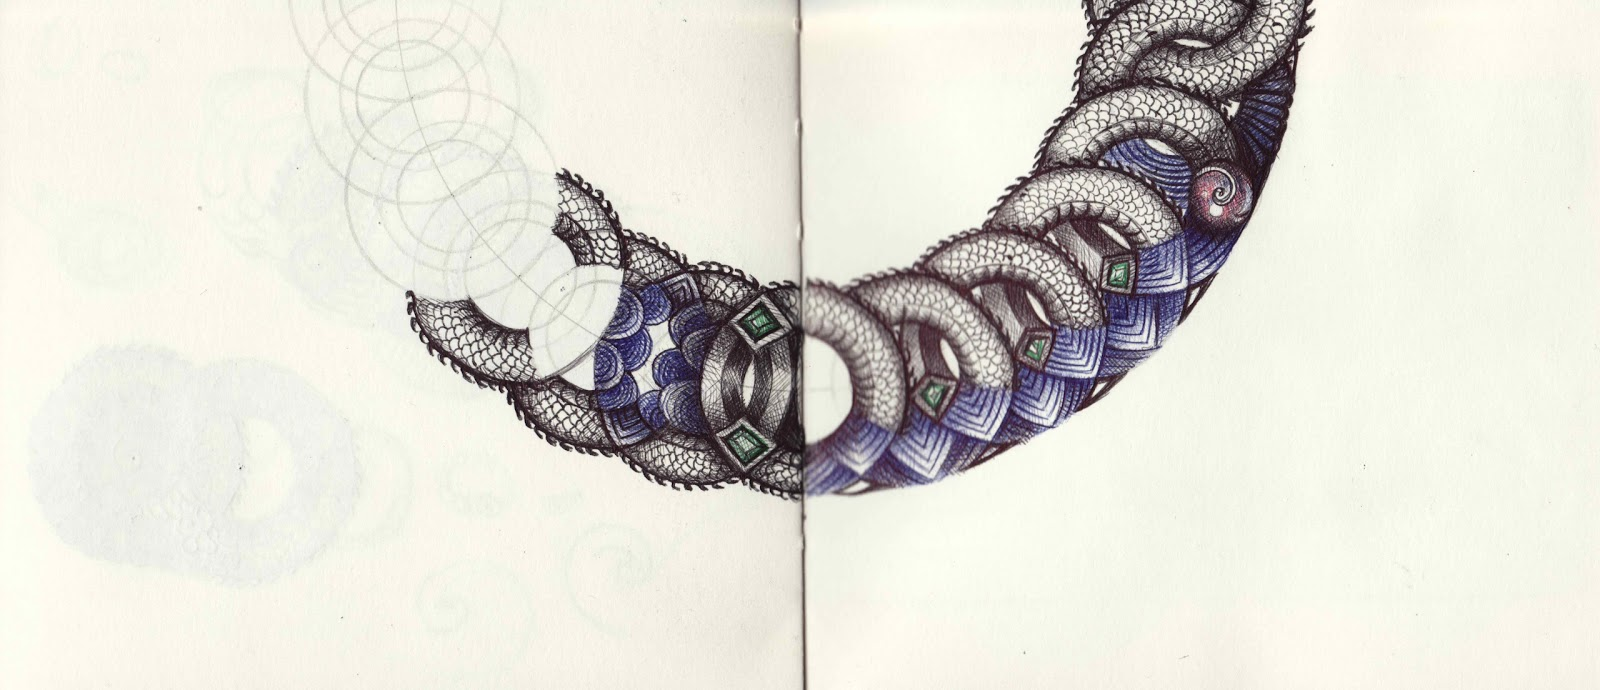 1600x690 Eugene Ceramic Artist Ballpoint Pen Drawings Of Jewellery